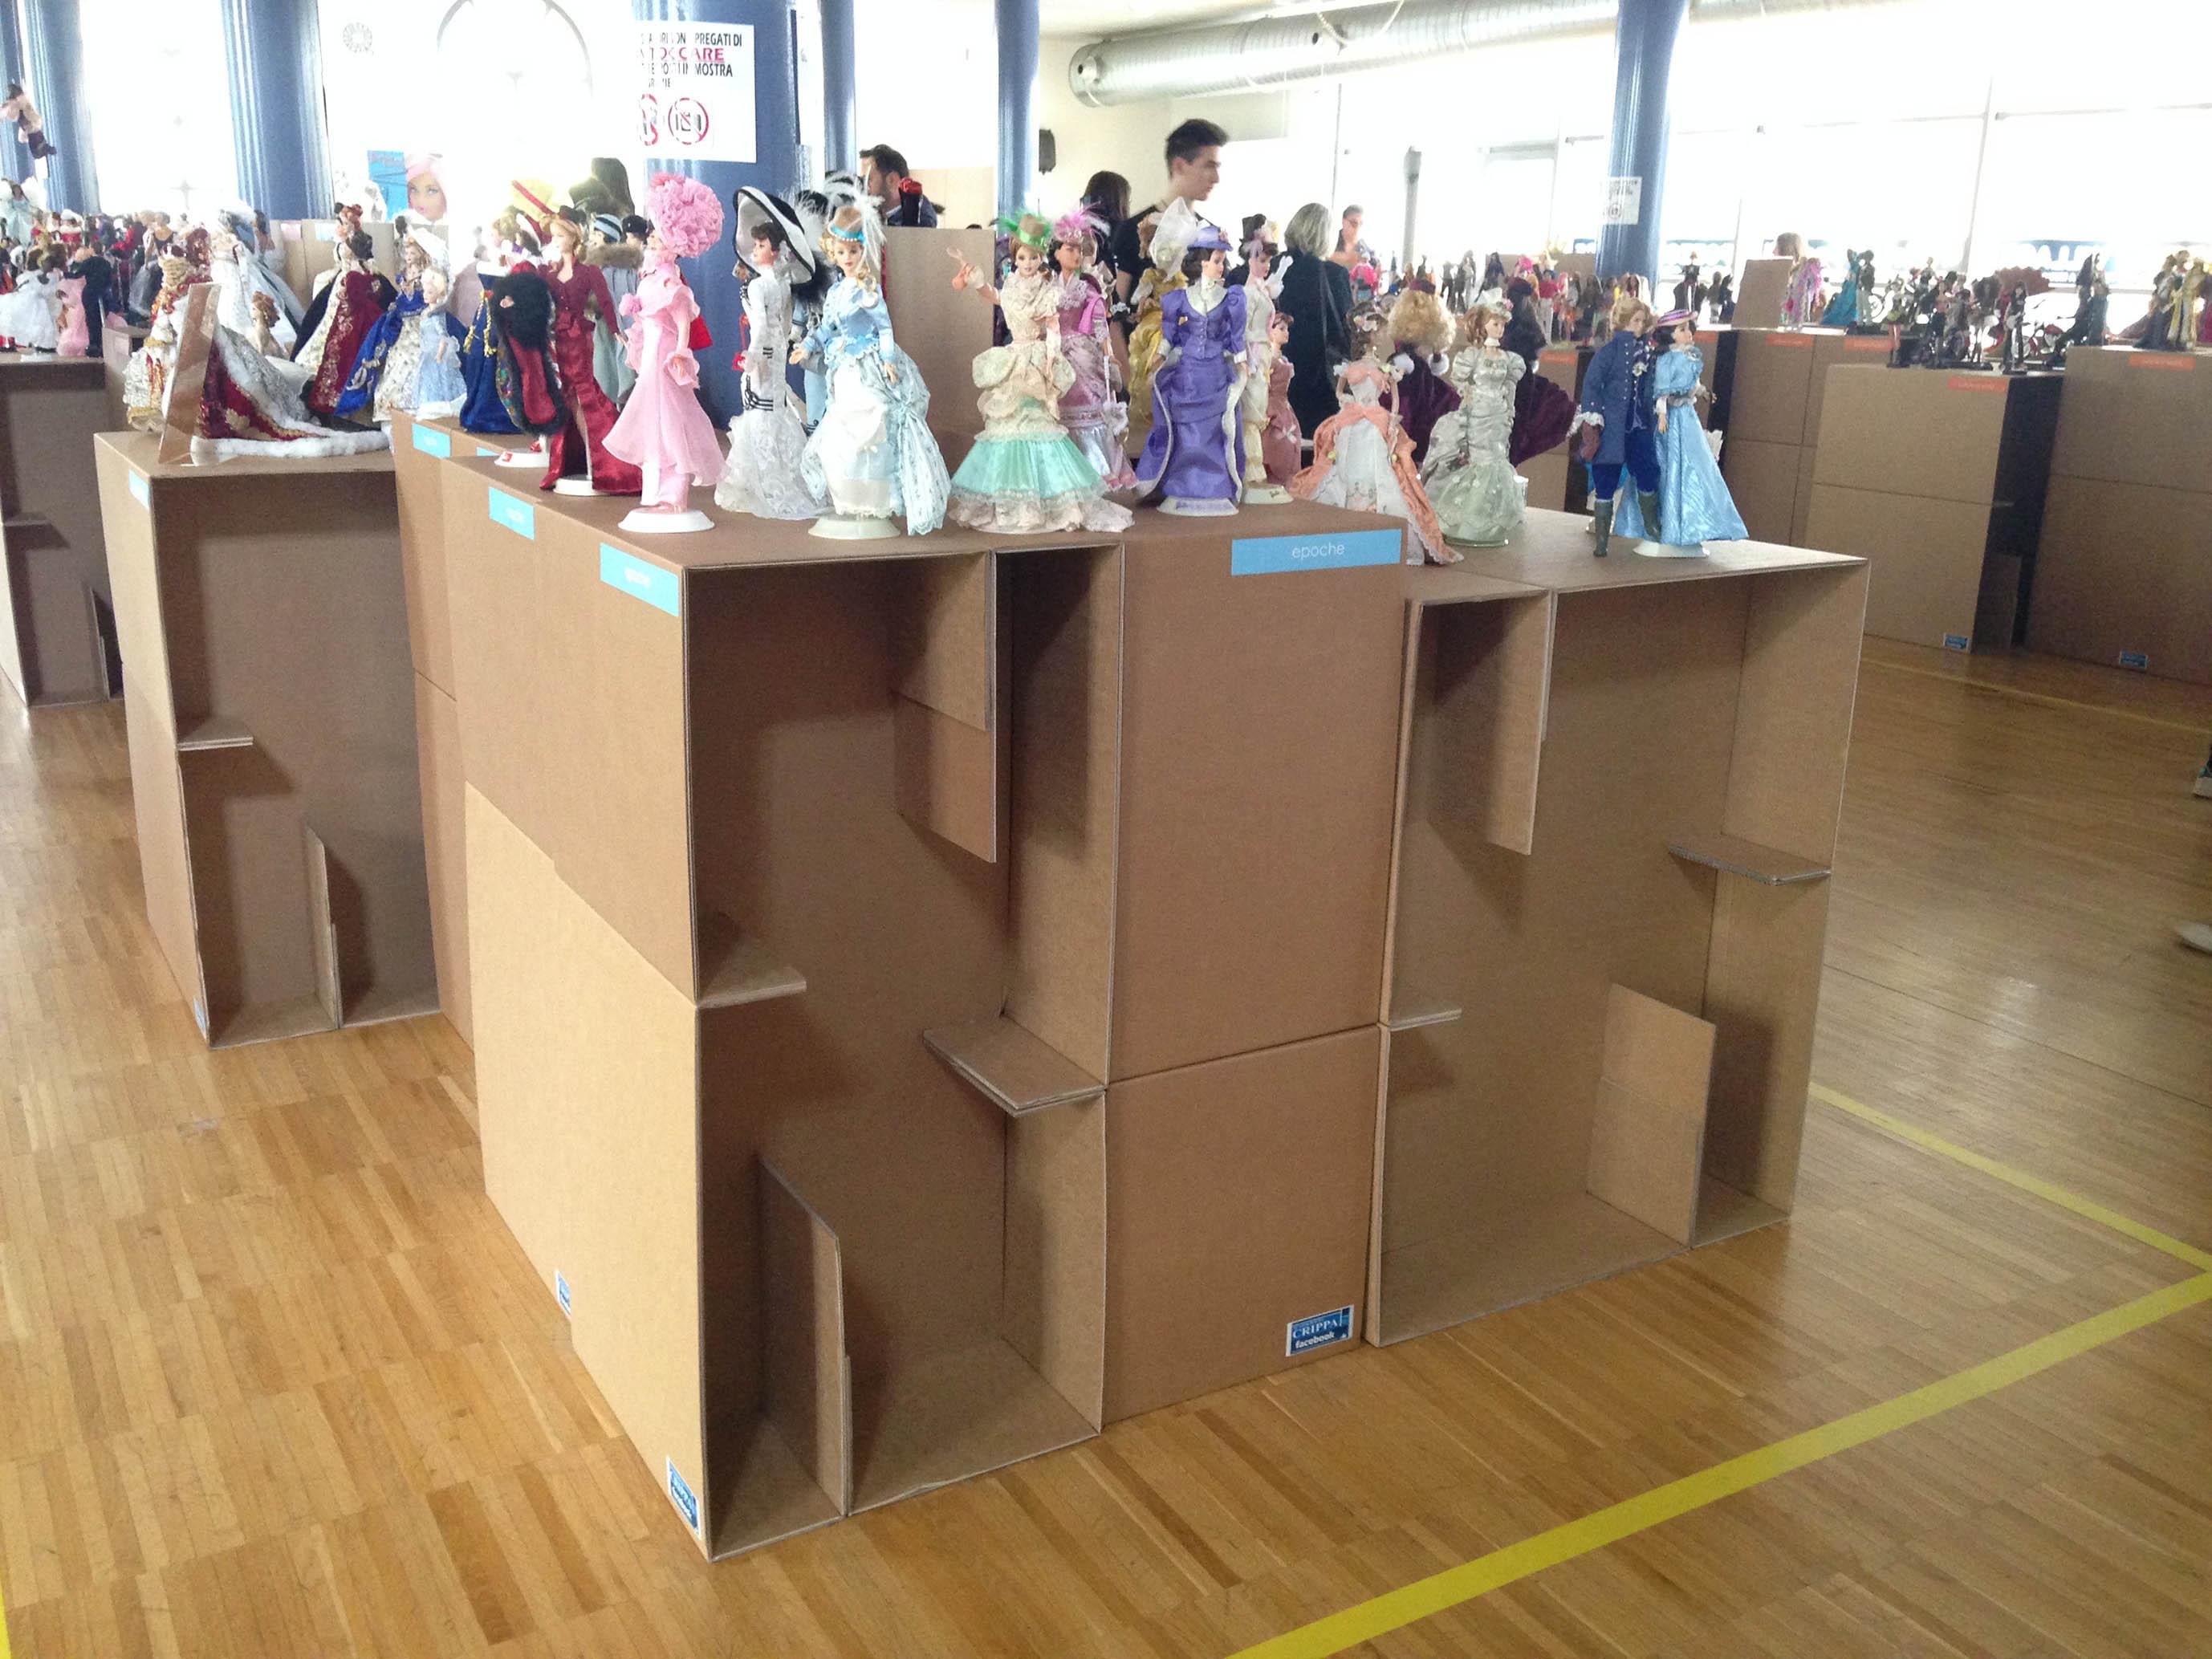 installazione cartone per mostra barbie